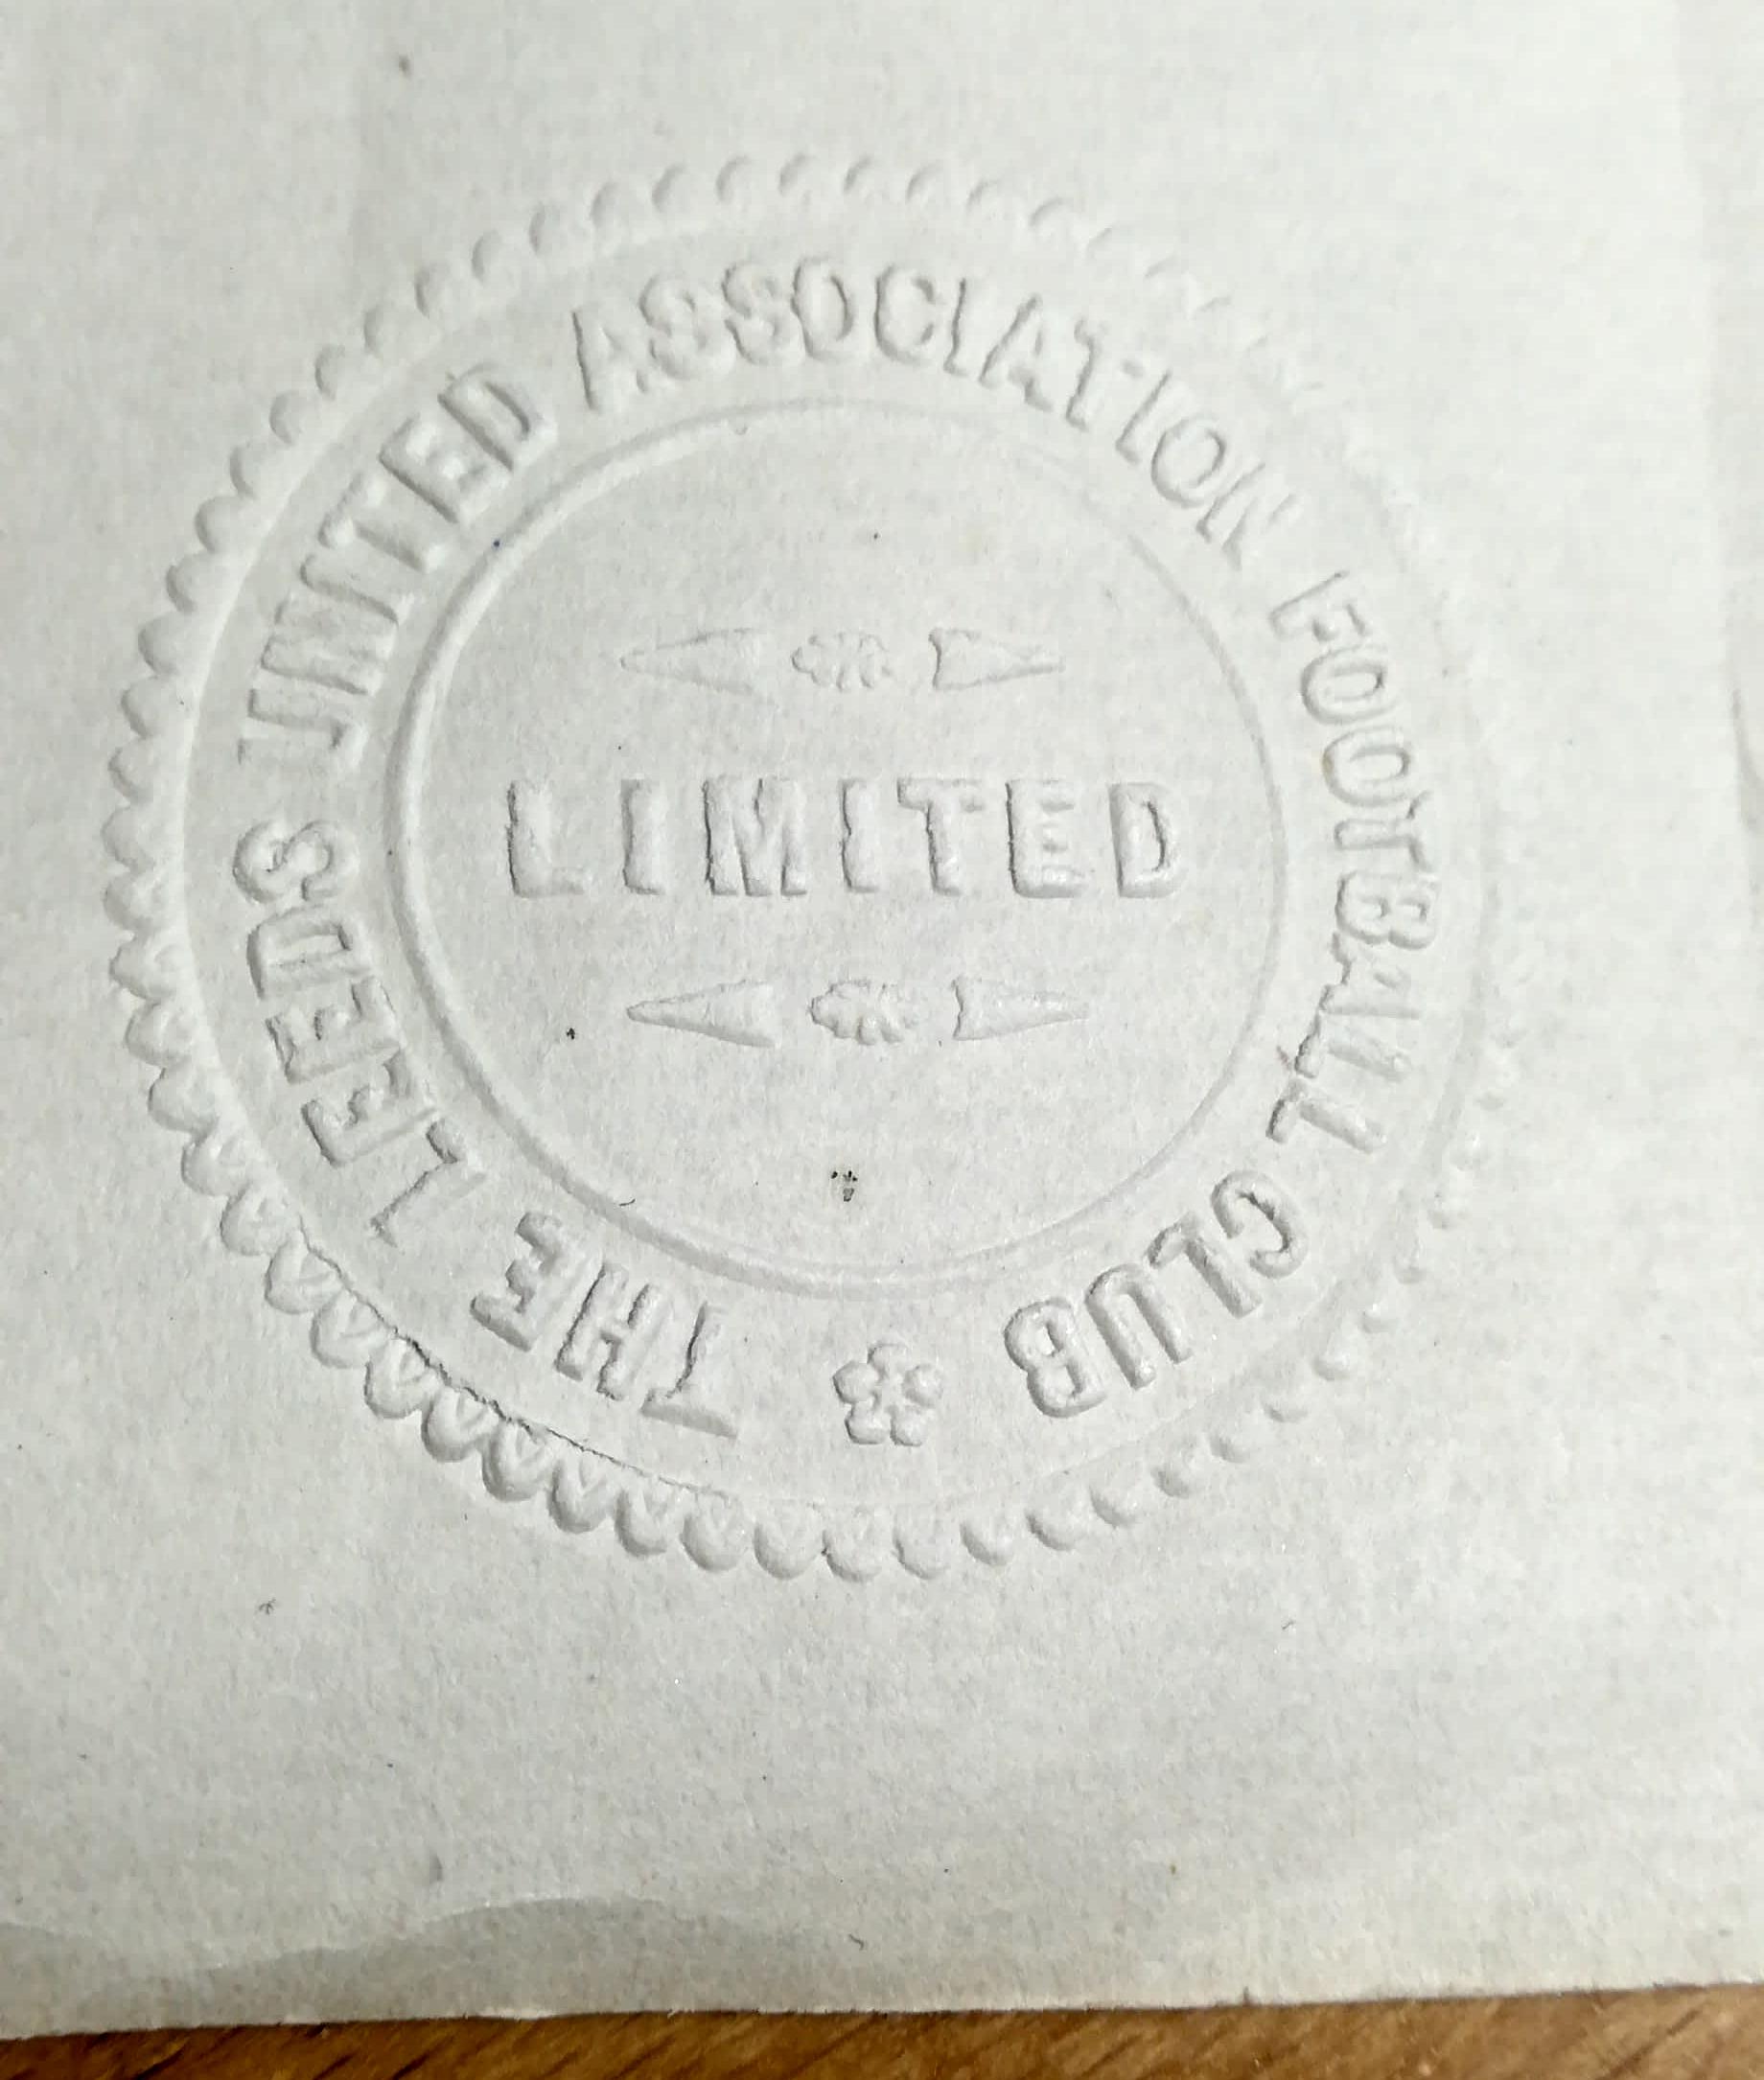 Leeds United share certificate